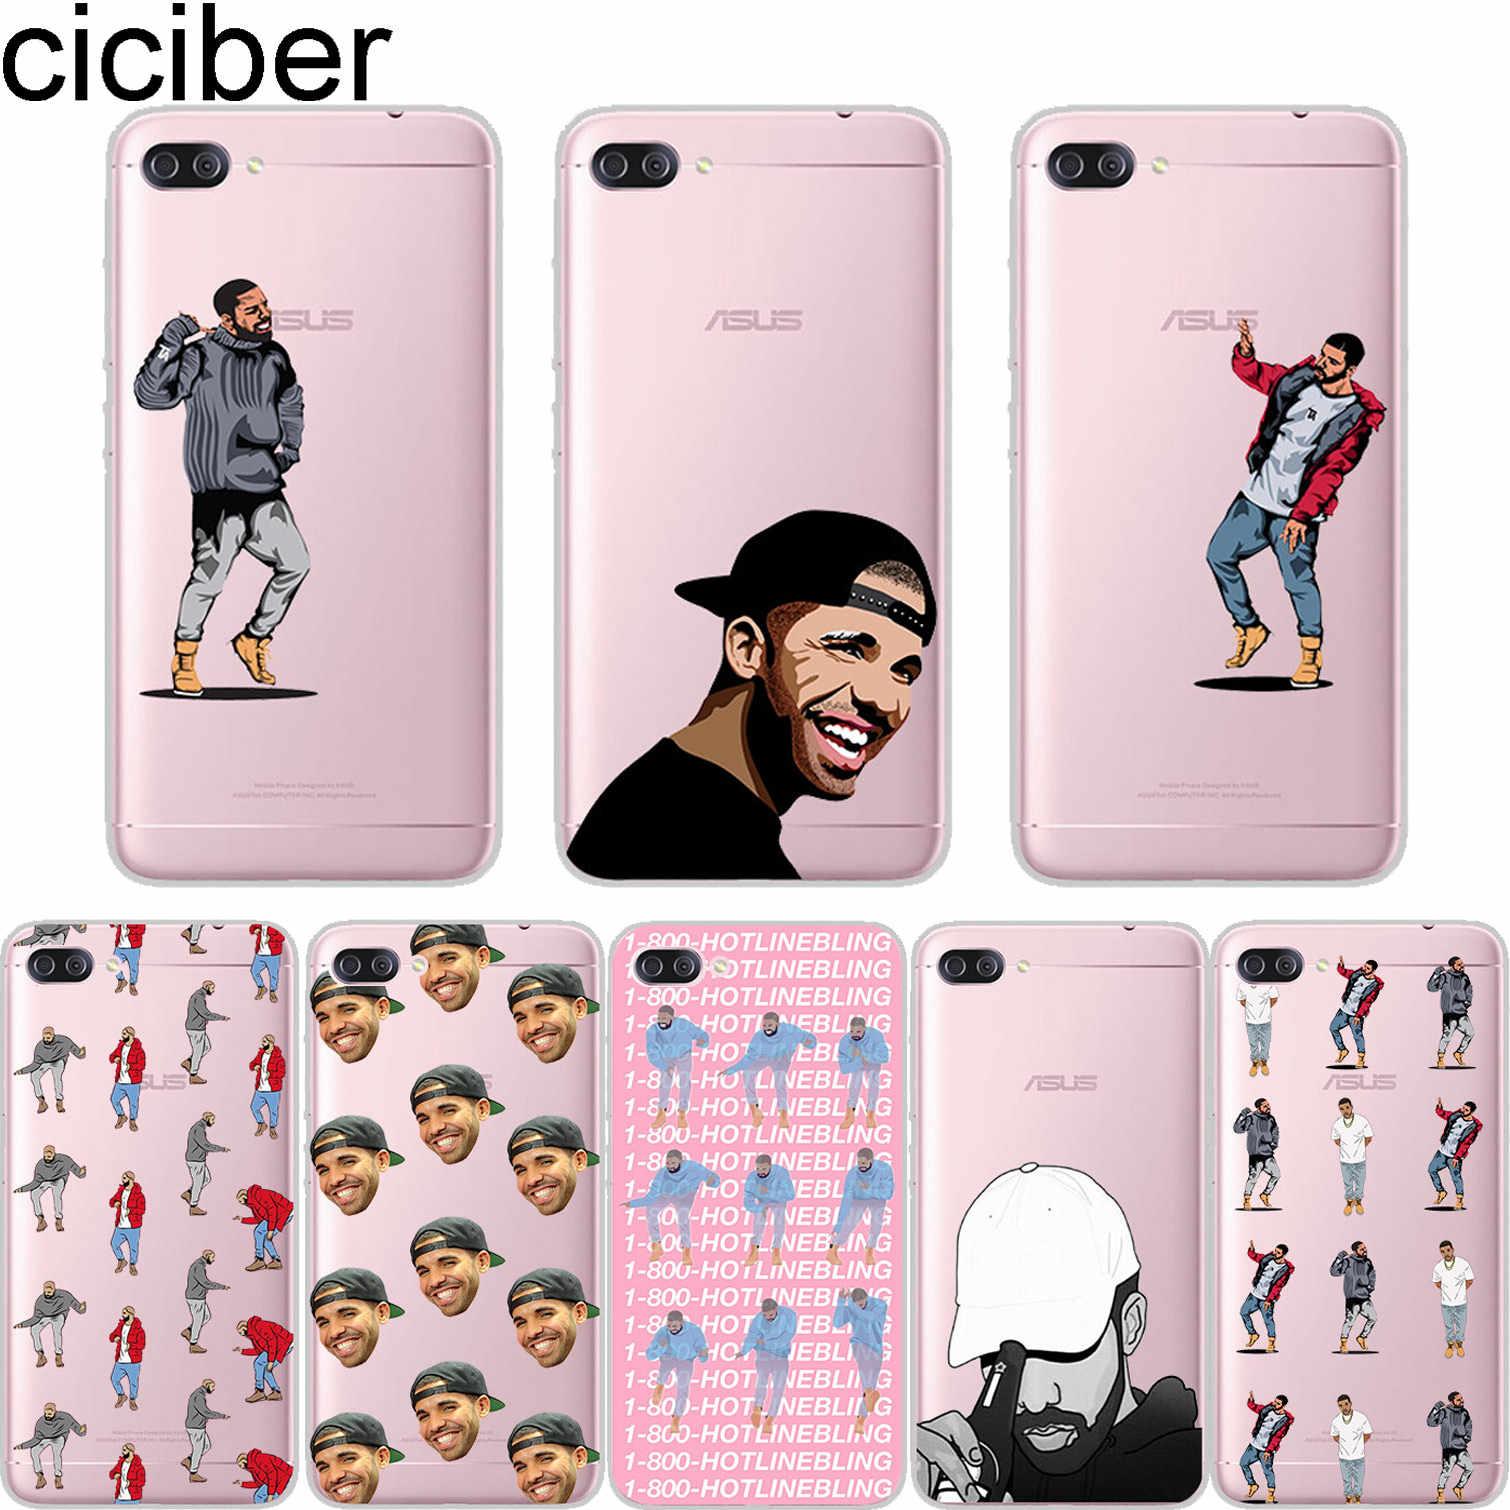 ciciber Singer Drake For ASUS ZenFone 5 4 3 3S Max Pro Plus Laser Deluxe  Selfie Z Q Lite Soft Cover Clear TPU Phones Cases Capa